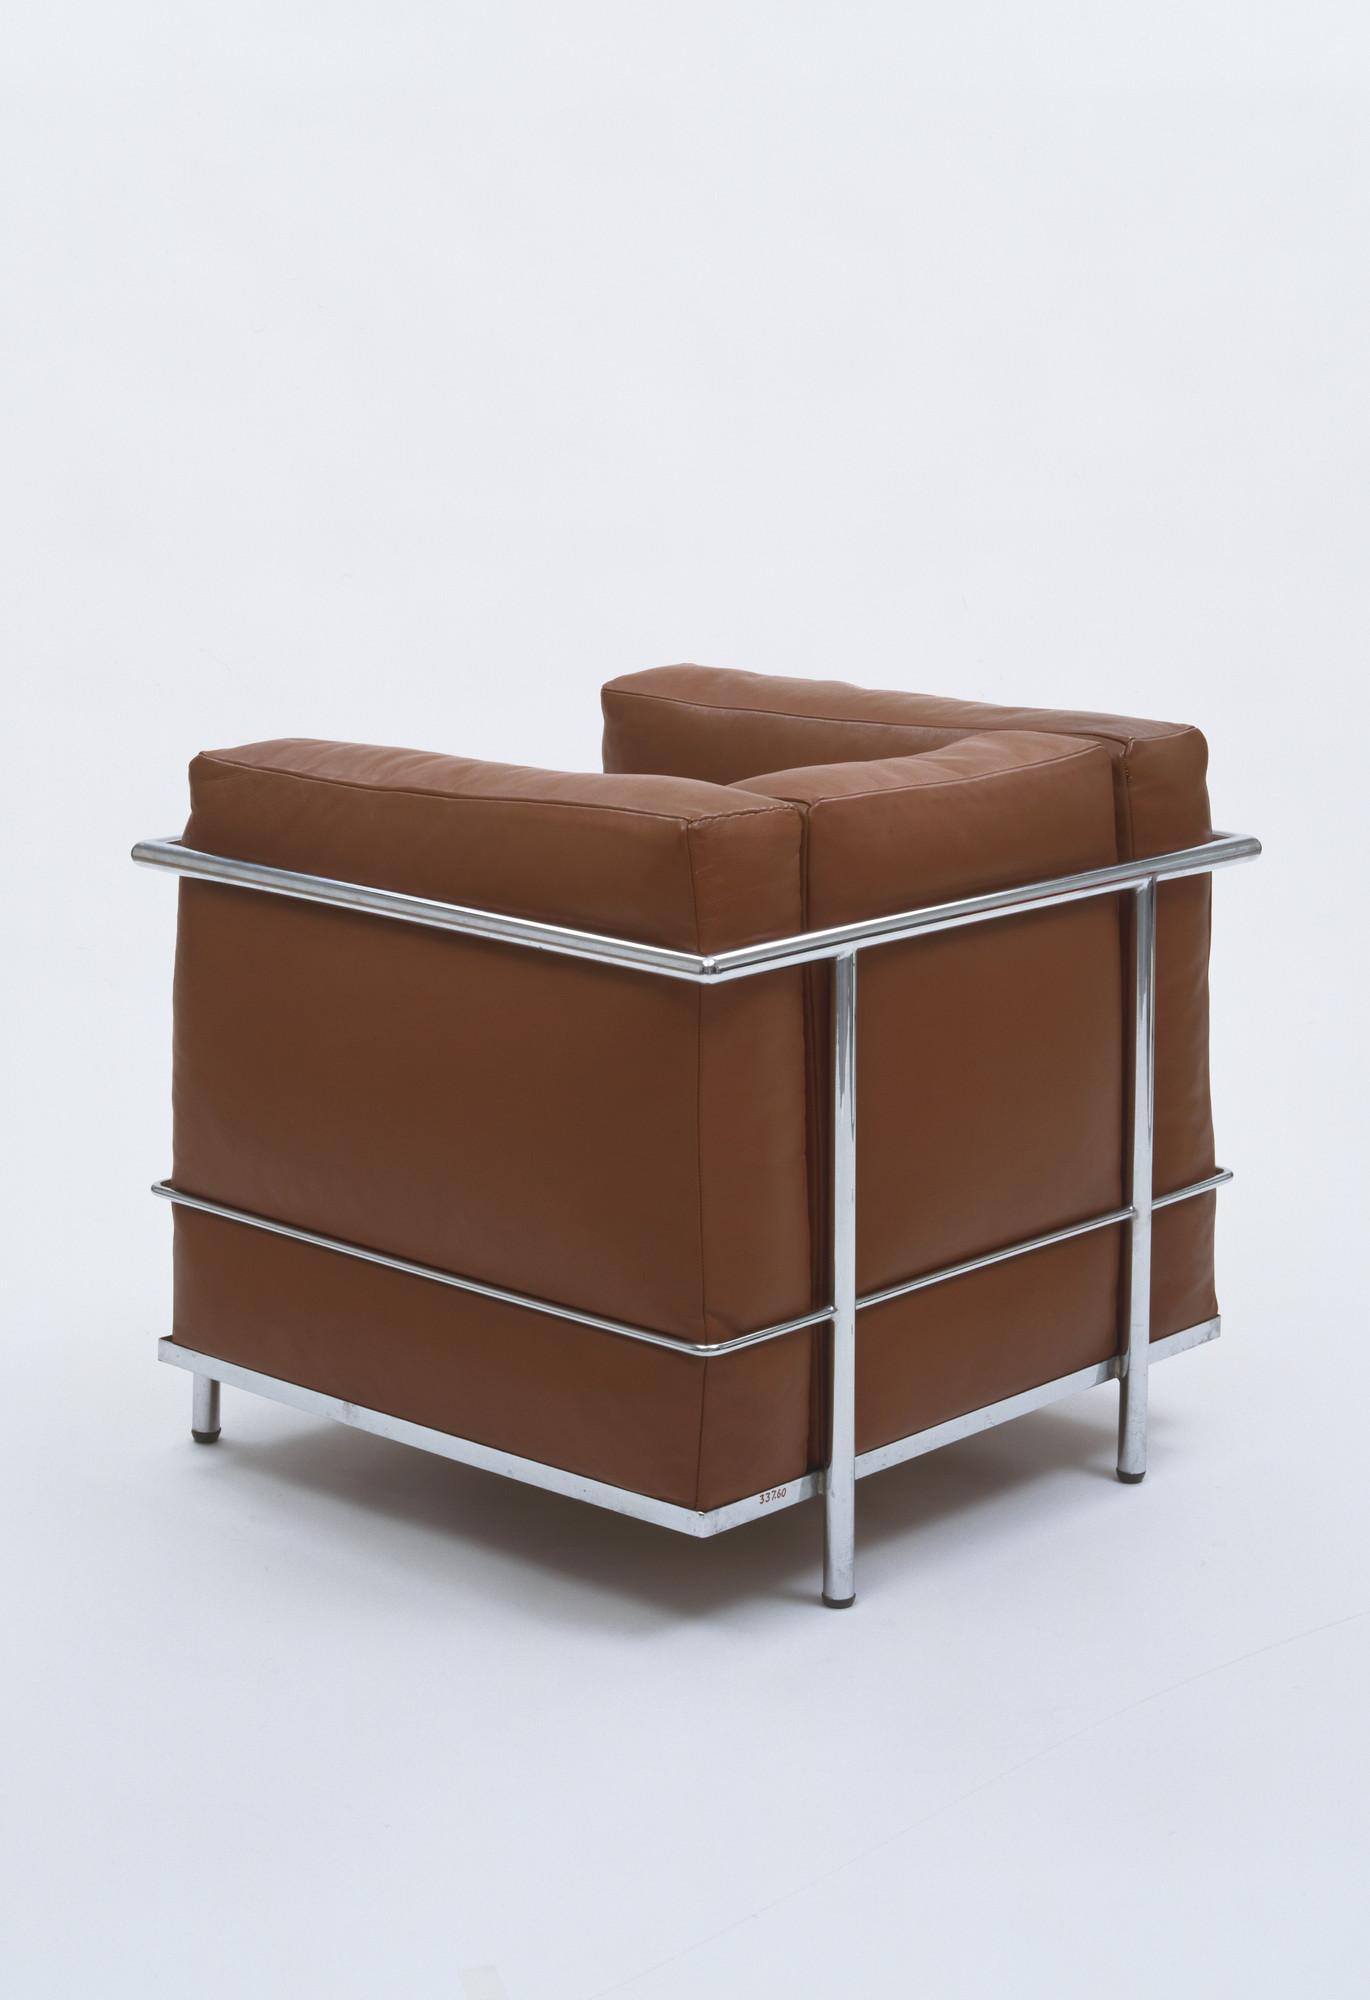 Incredible Le Corbusier Charles Edouard Jeanneret Pierre Jeanneret Inzonedesignstudio Interior Chair Design Inzonedesignstudiocom